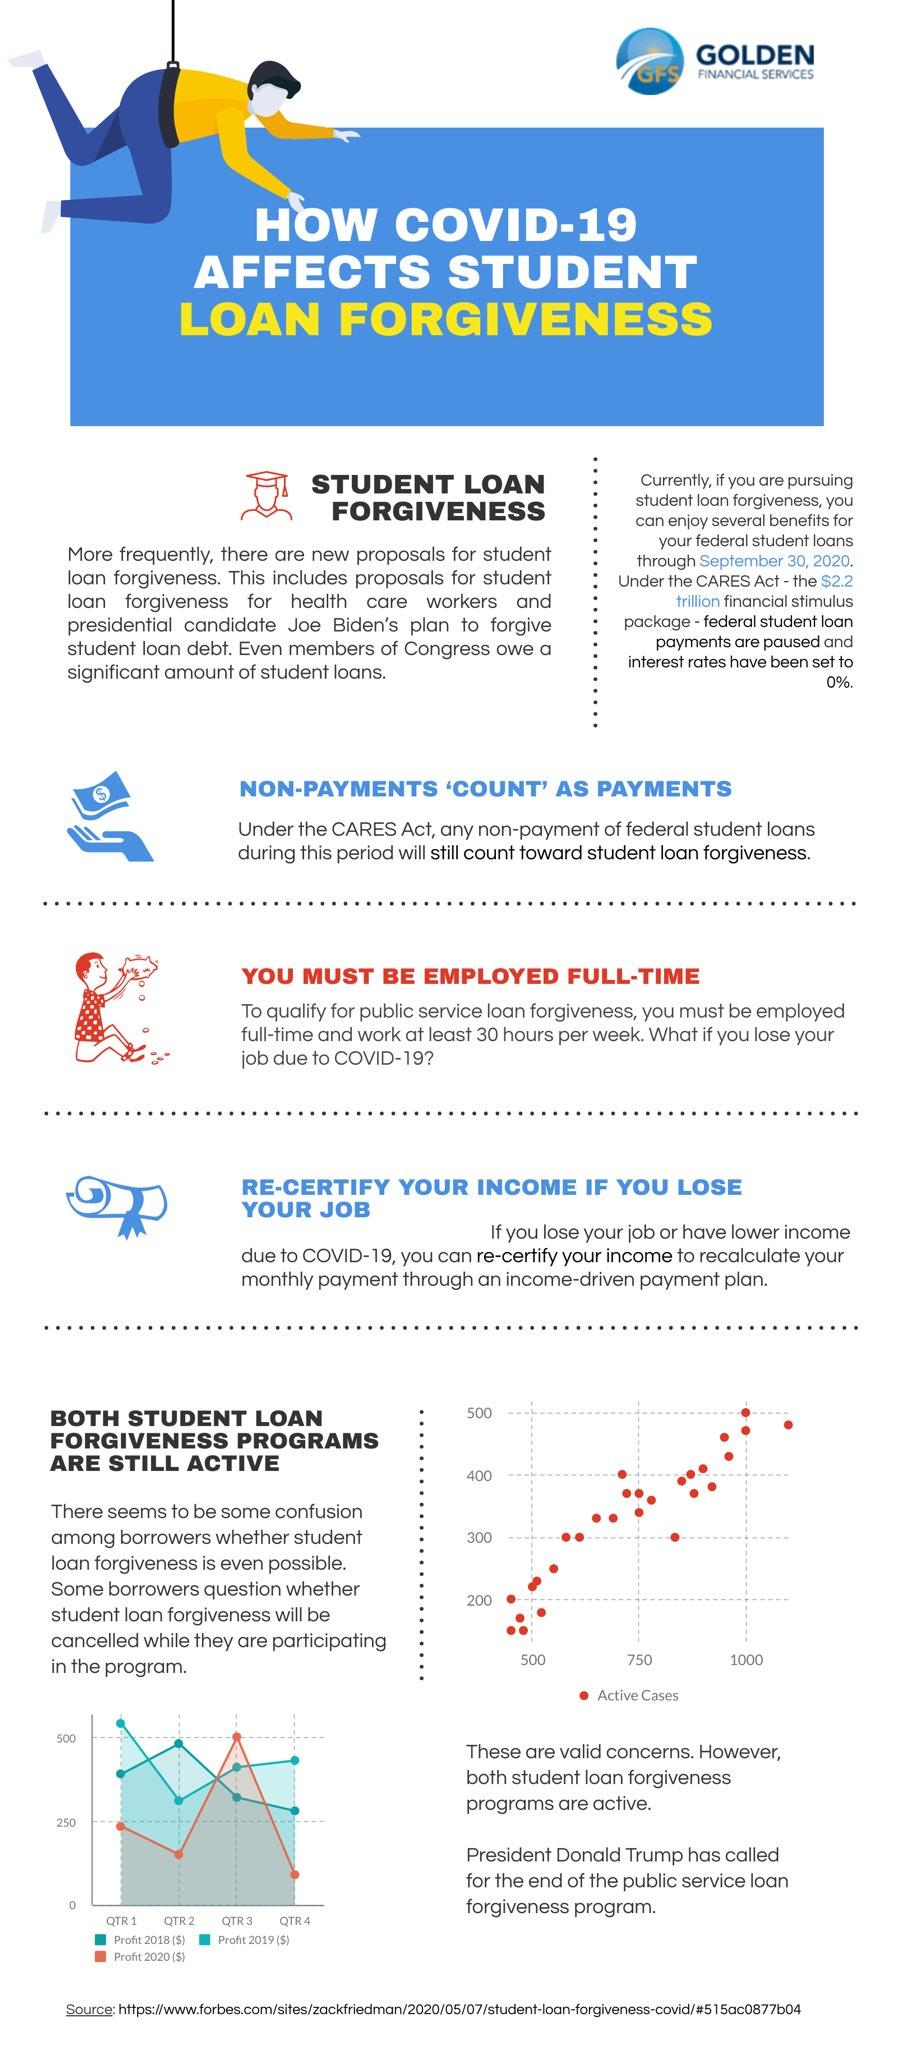 how COVID-19 effects student loan forgiveness